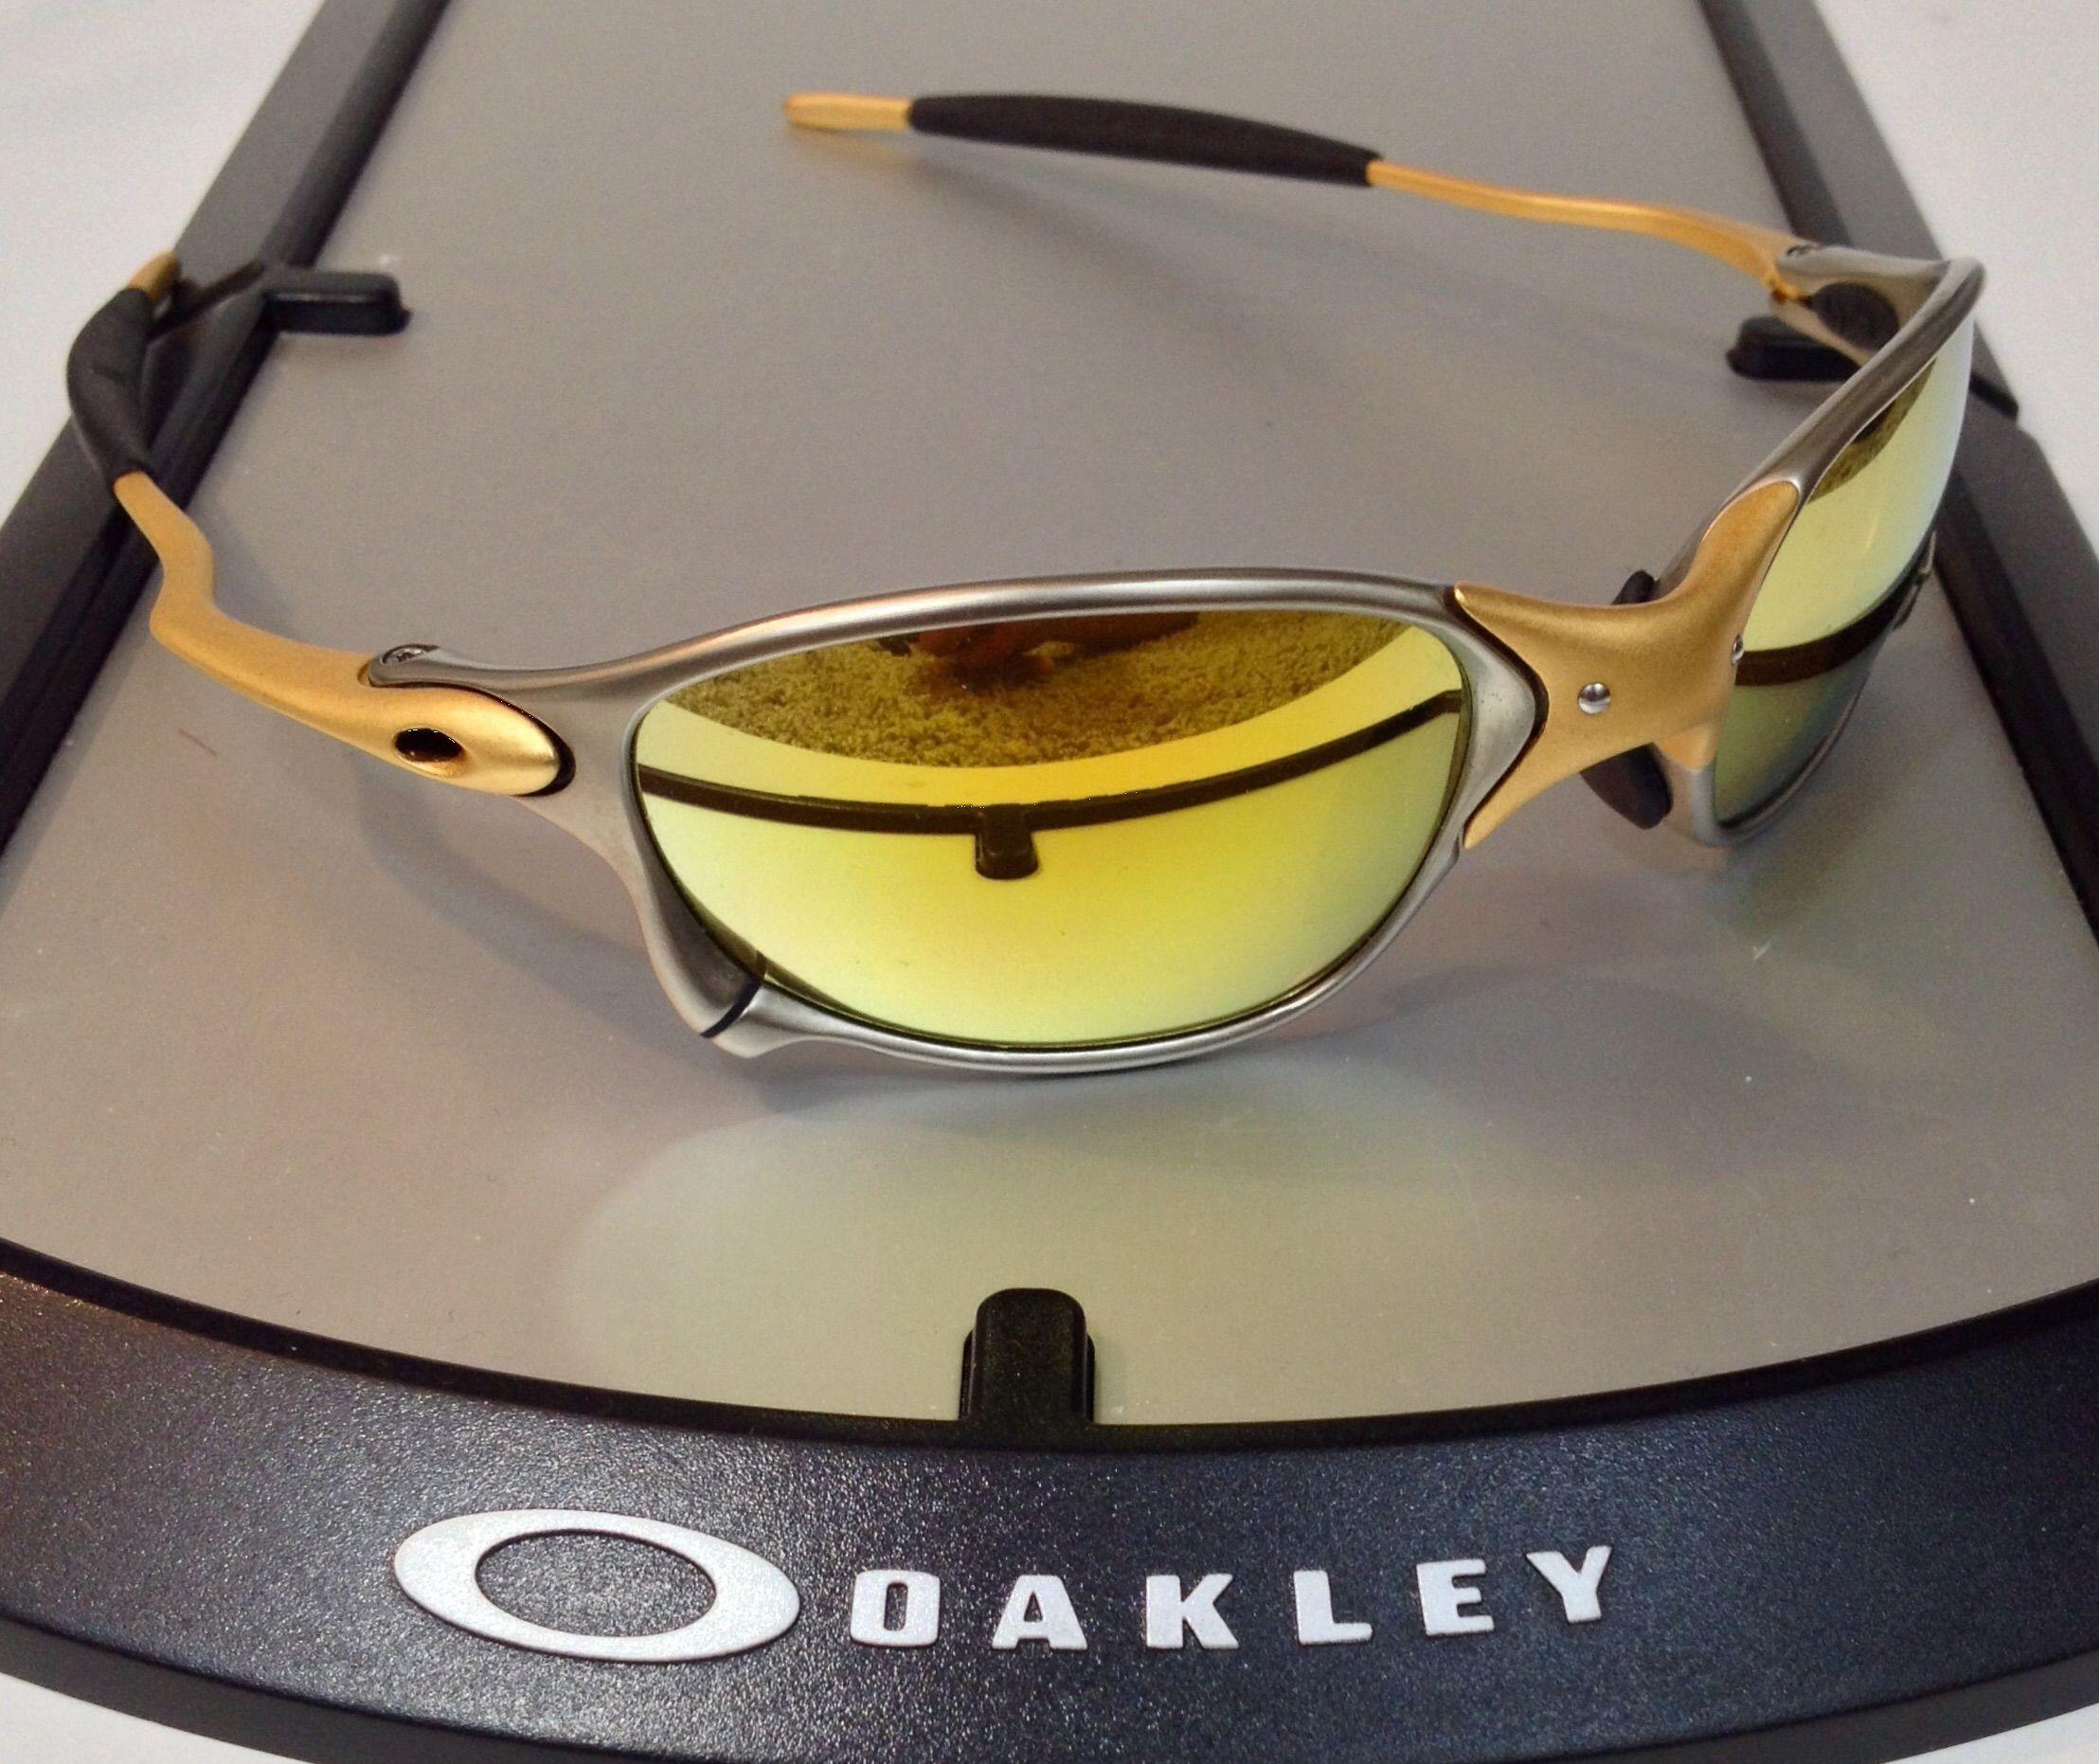 Oakley Sunglasses Sunglasses 16 Awesome Oakley Girl Sunglasses Suggestions In 2020 Oakley Sunglasses Girl With Sunglasses Cheap Oakley Sunglasses